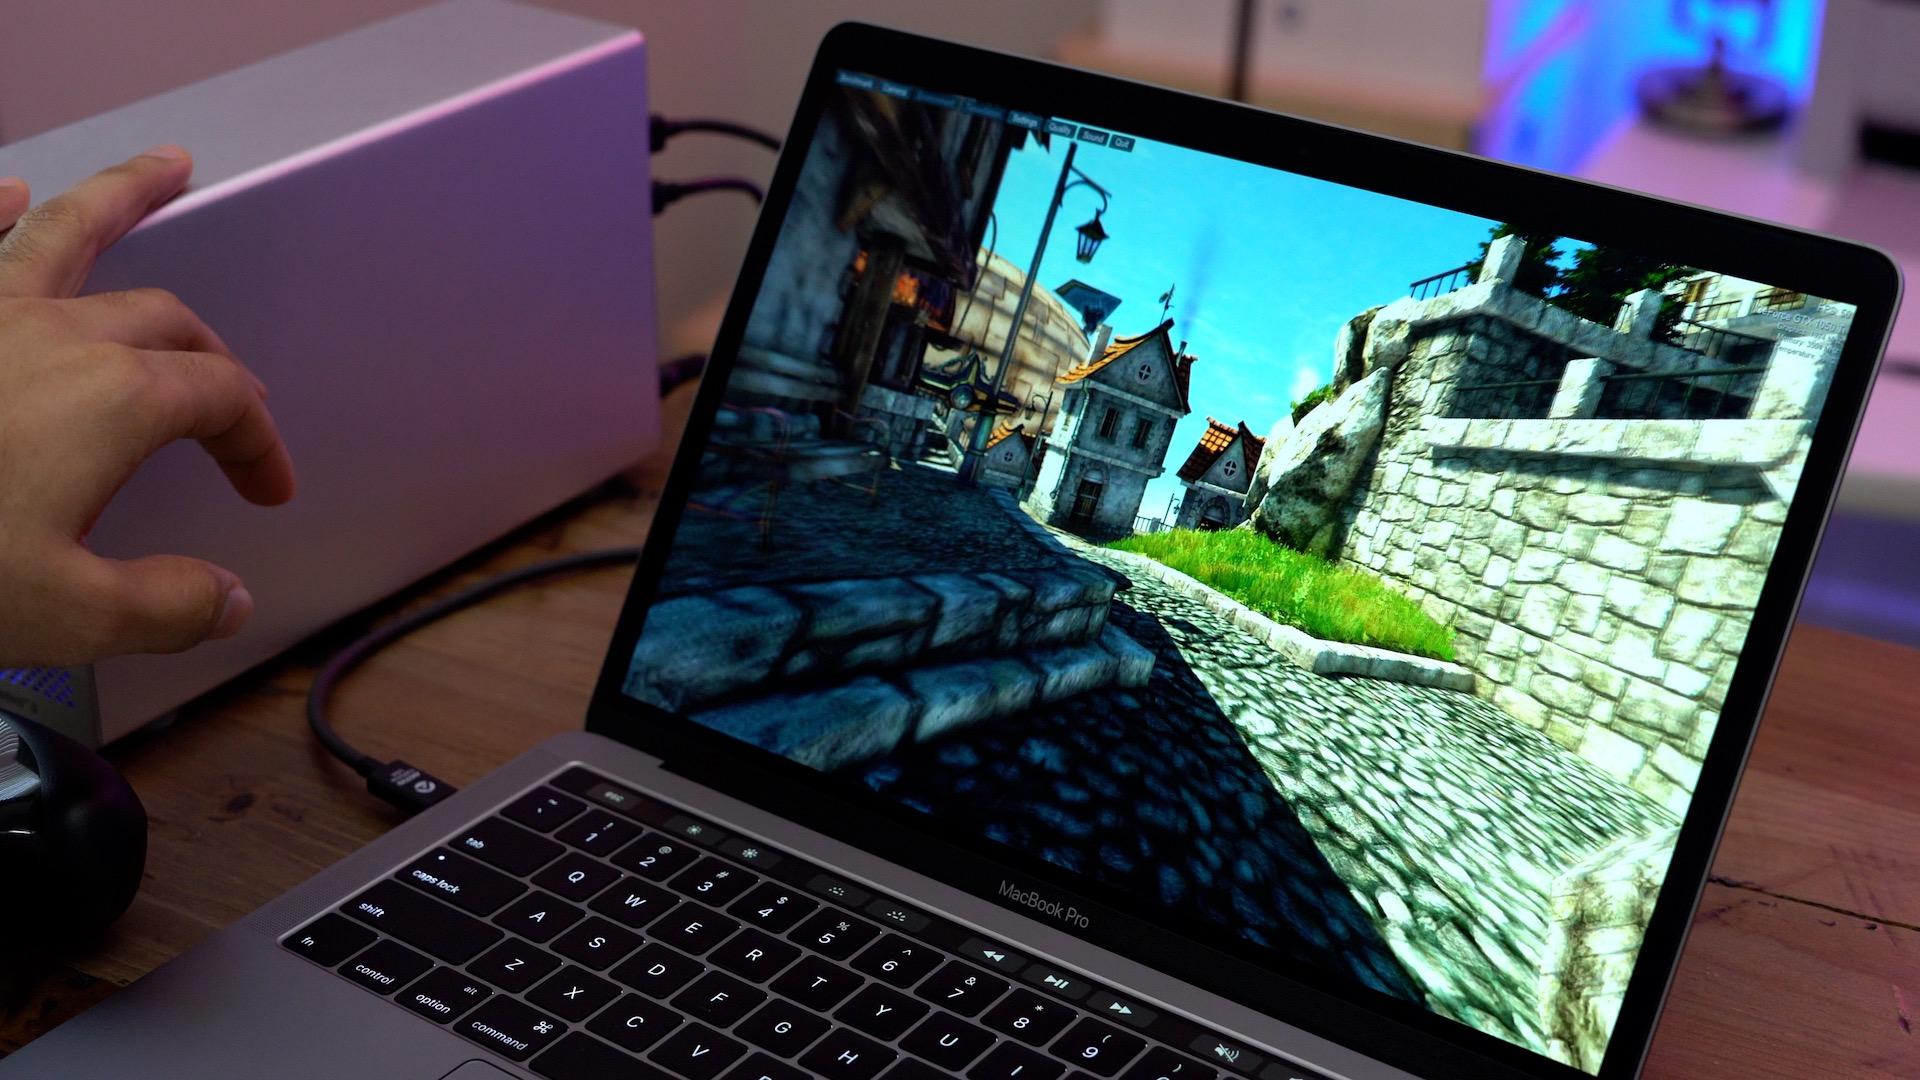 akitio-thunder3-benchmarks-internal-macbook-pro-screen